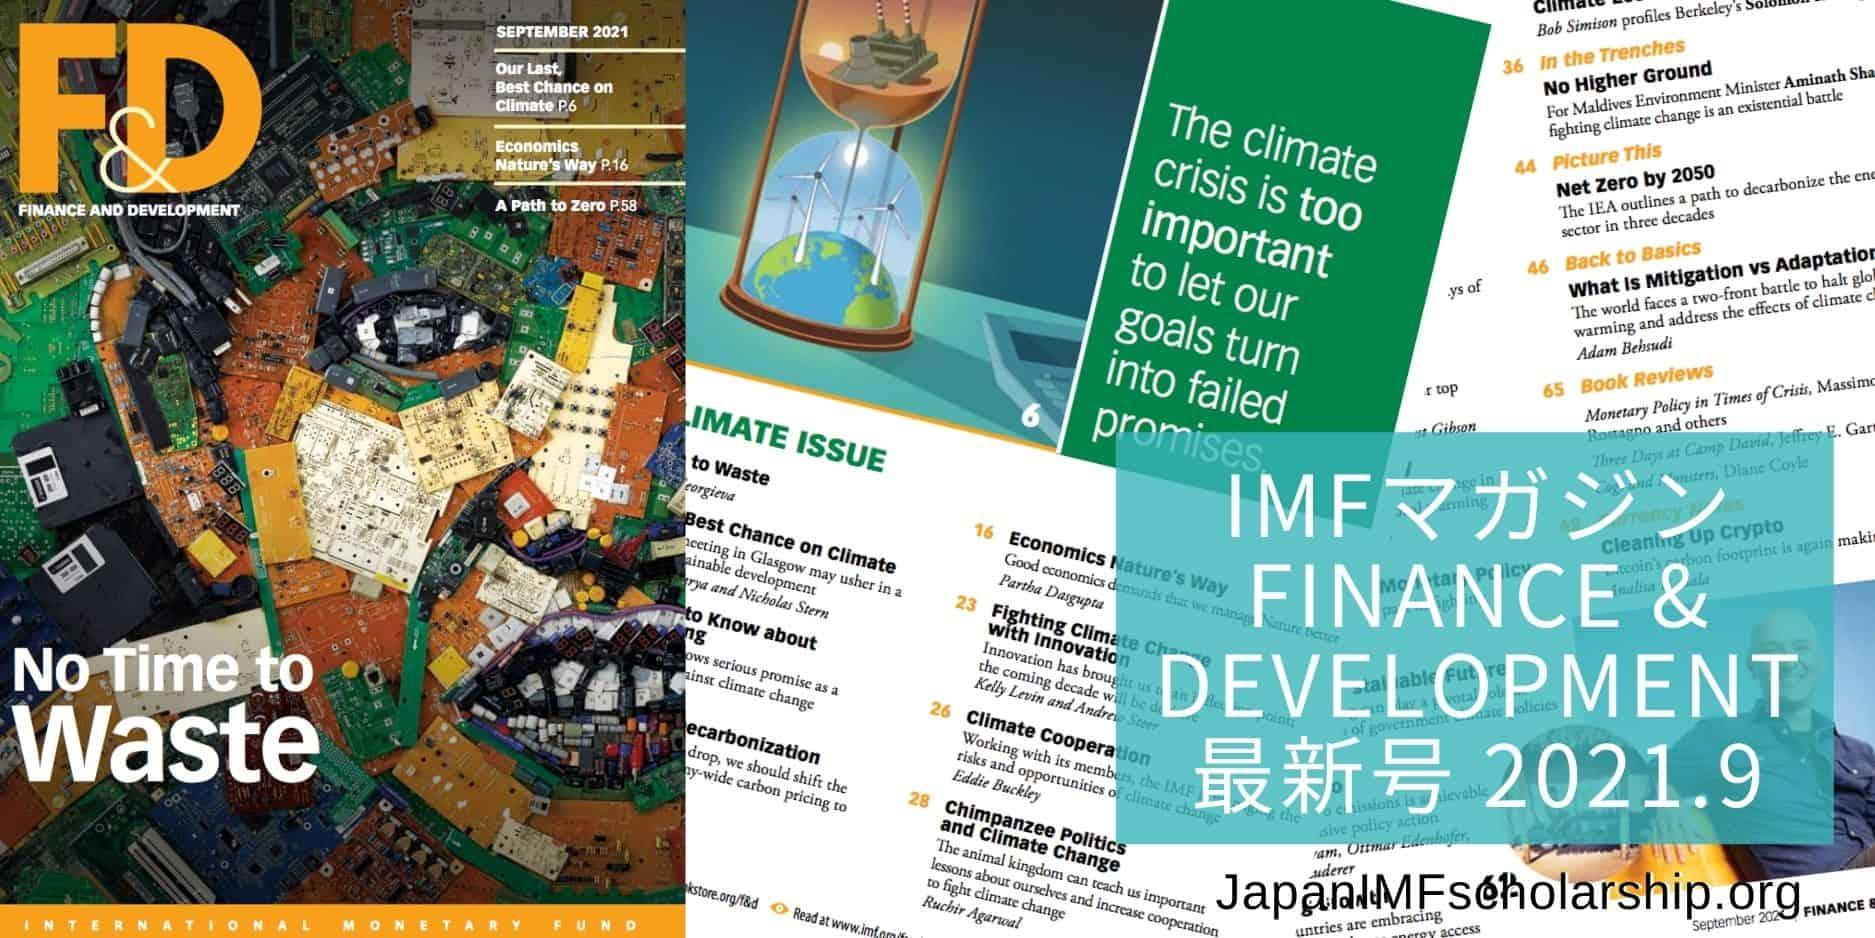 jisp imf magazine finance and development no time to waste september 2021